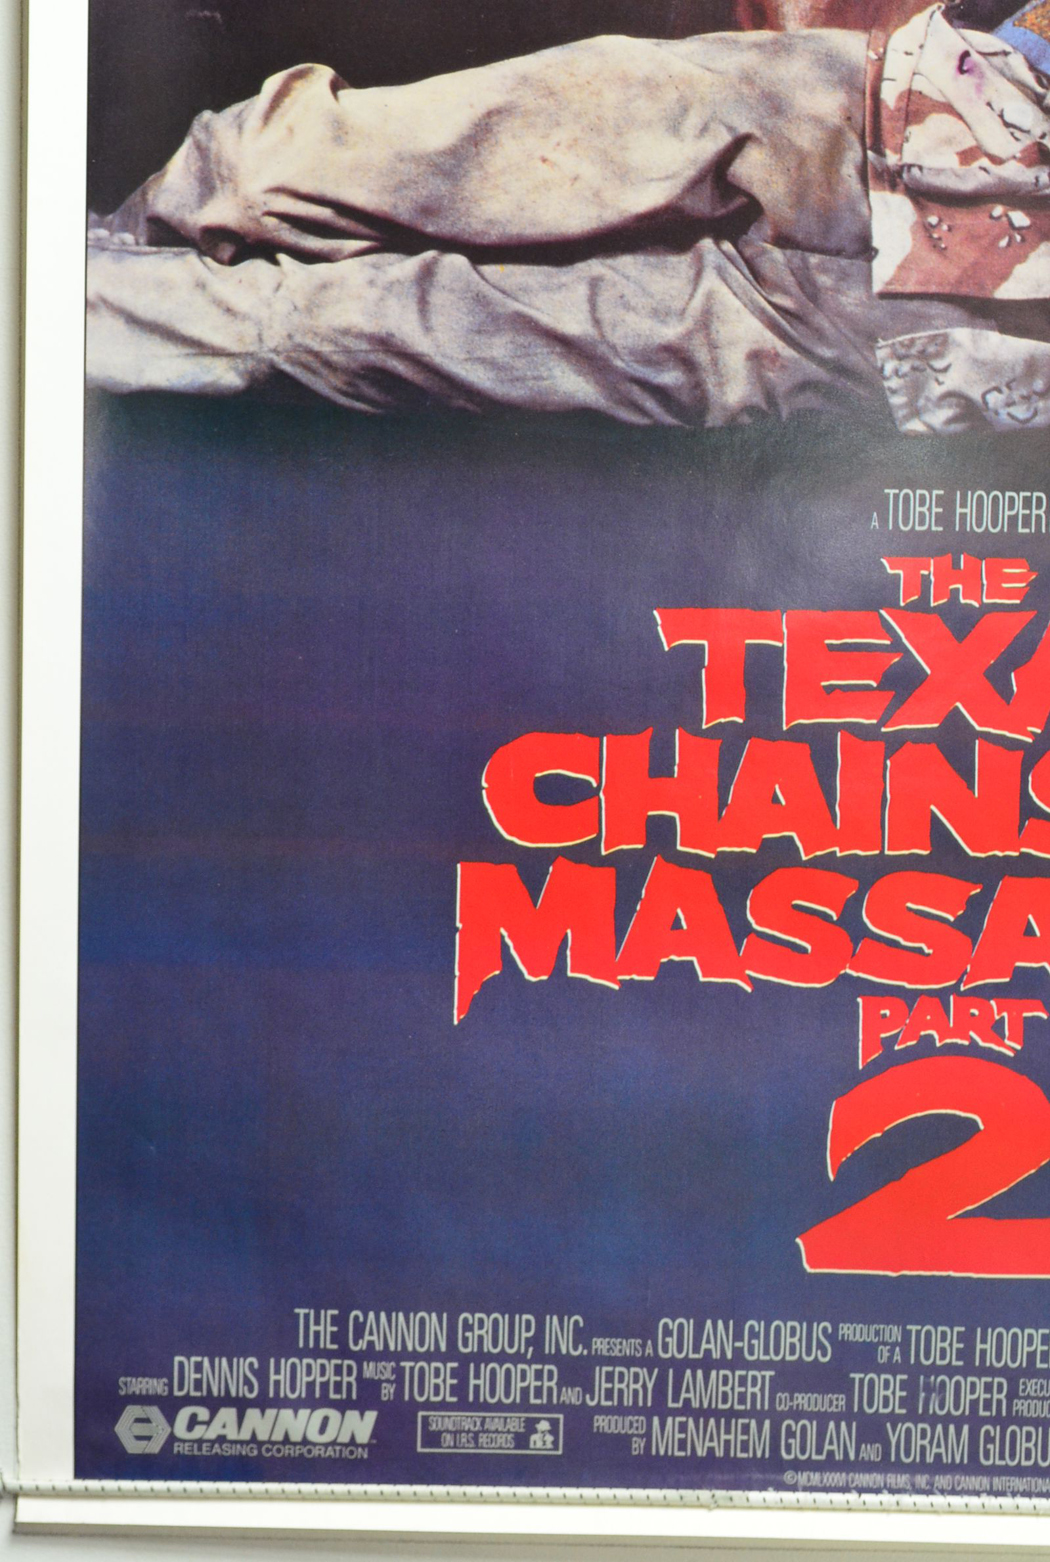 Texas Chainsaw Massacre Part 2 (The) - Original Cinema Movie Poster From pastposters.com British ...